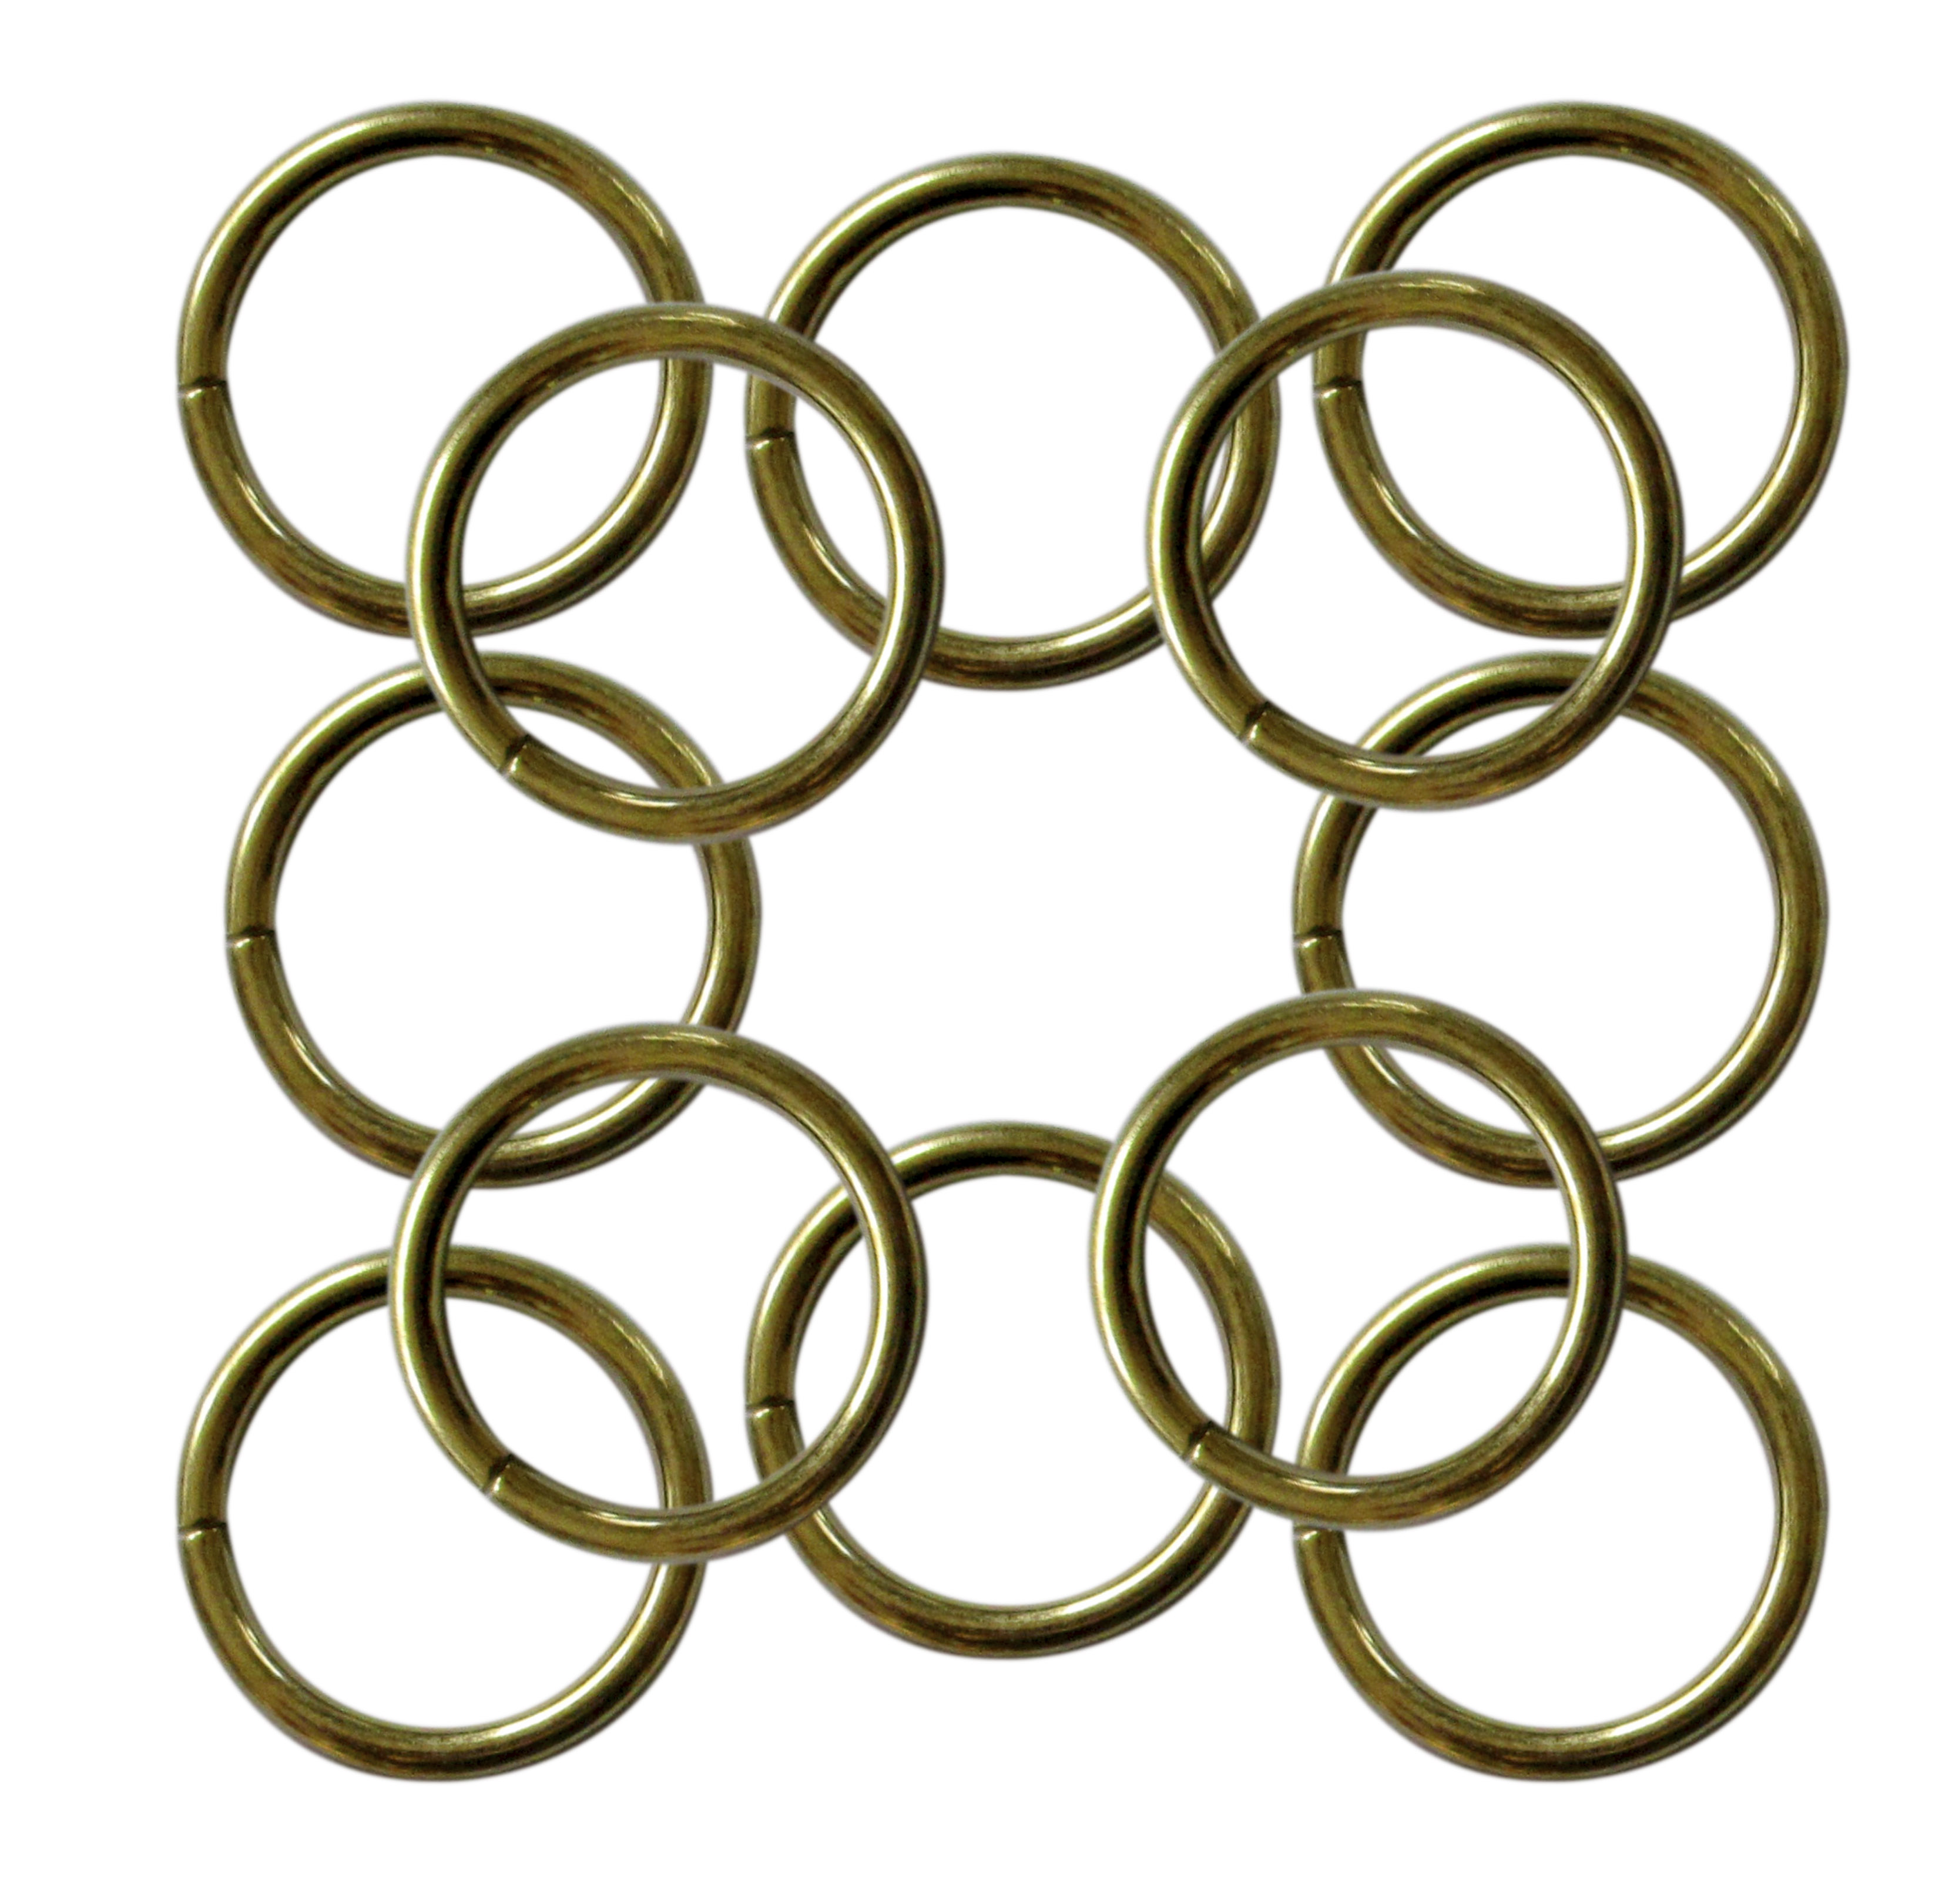 38mm 3 colours Metal O Rings unwelded 25 32